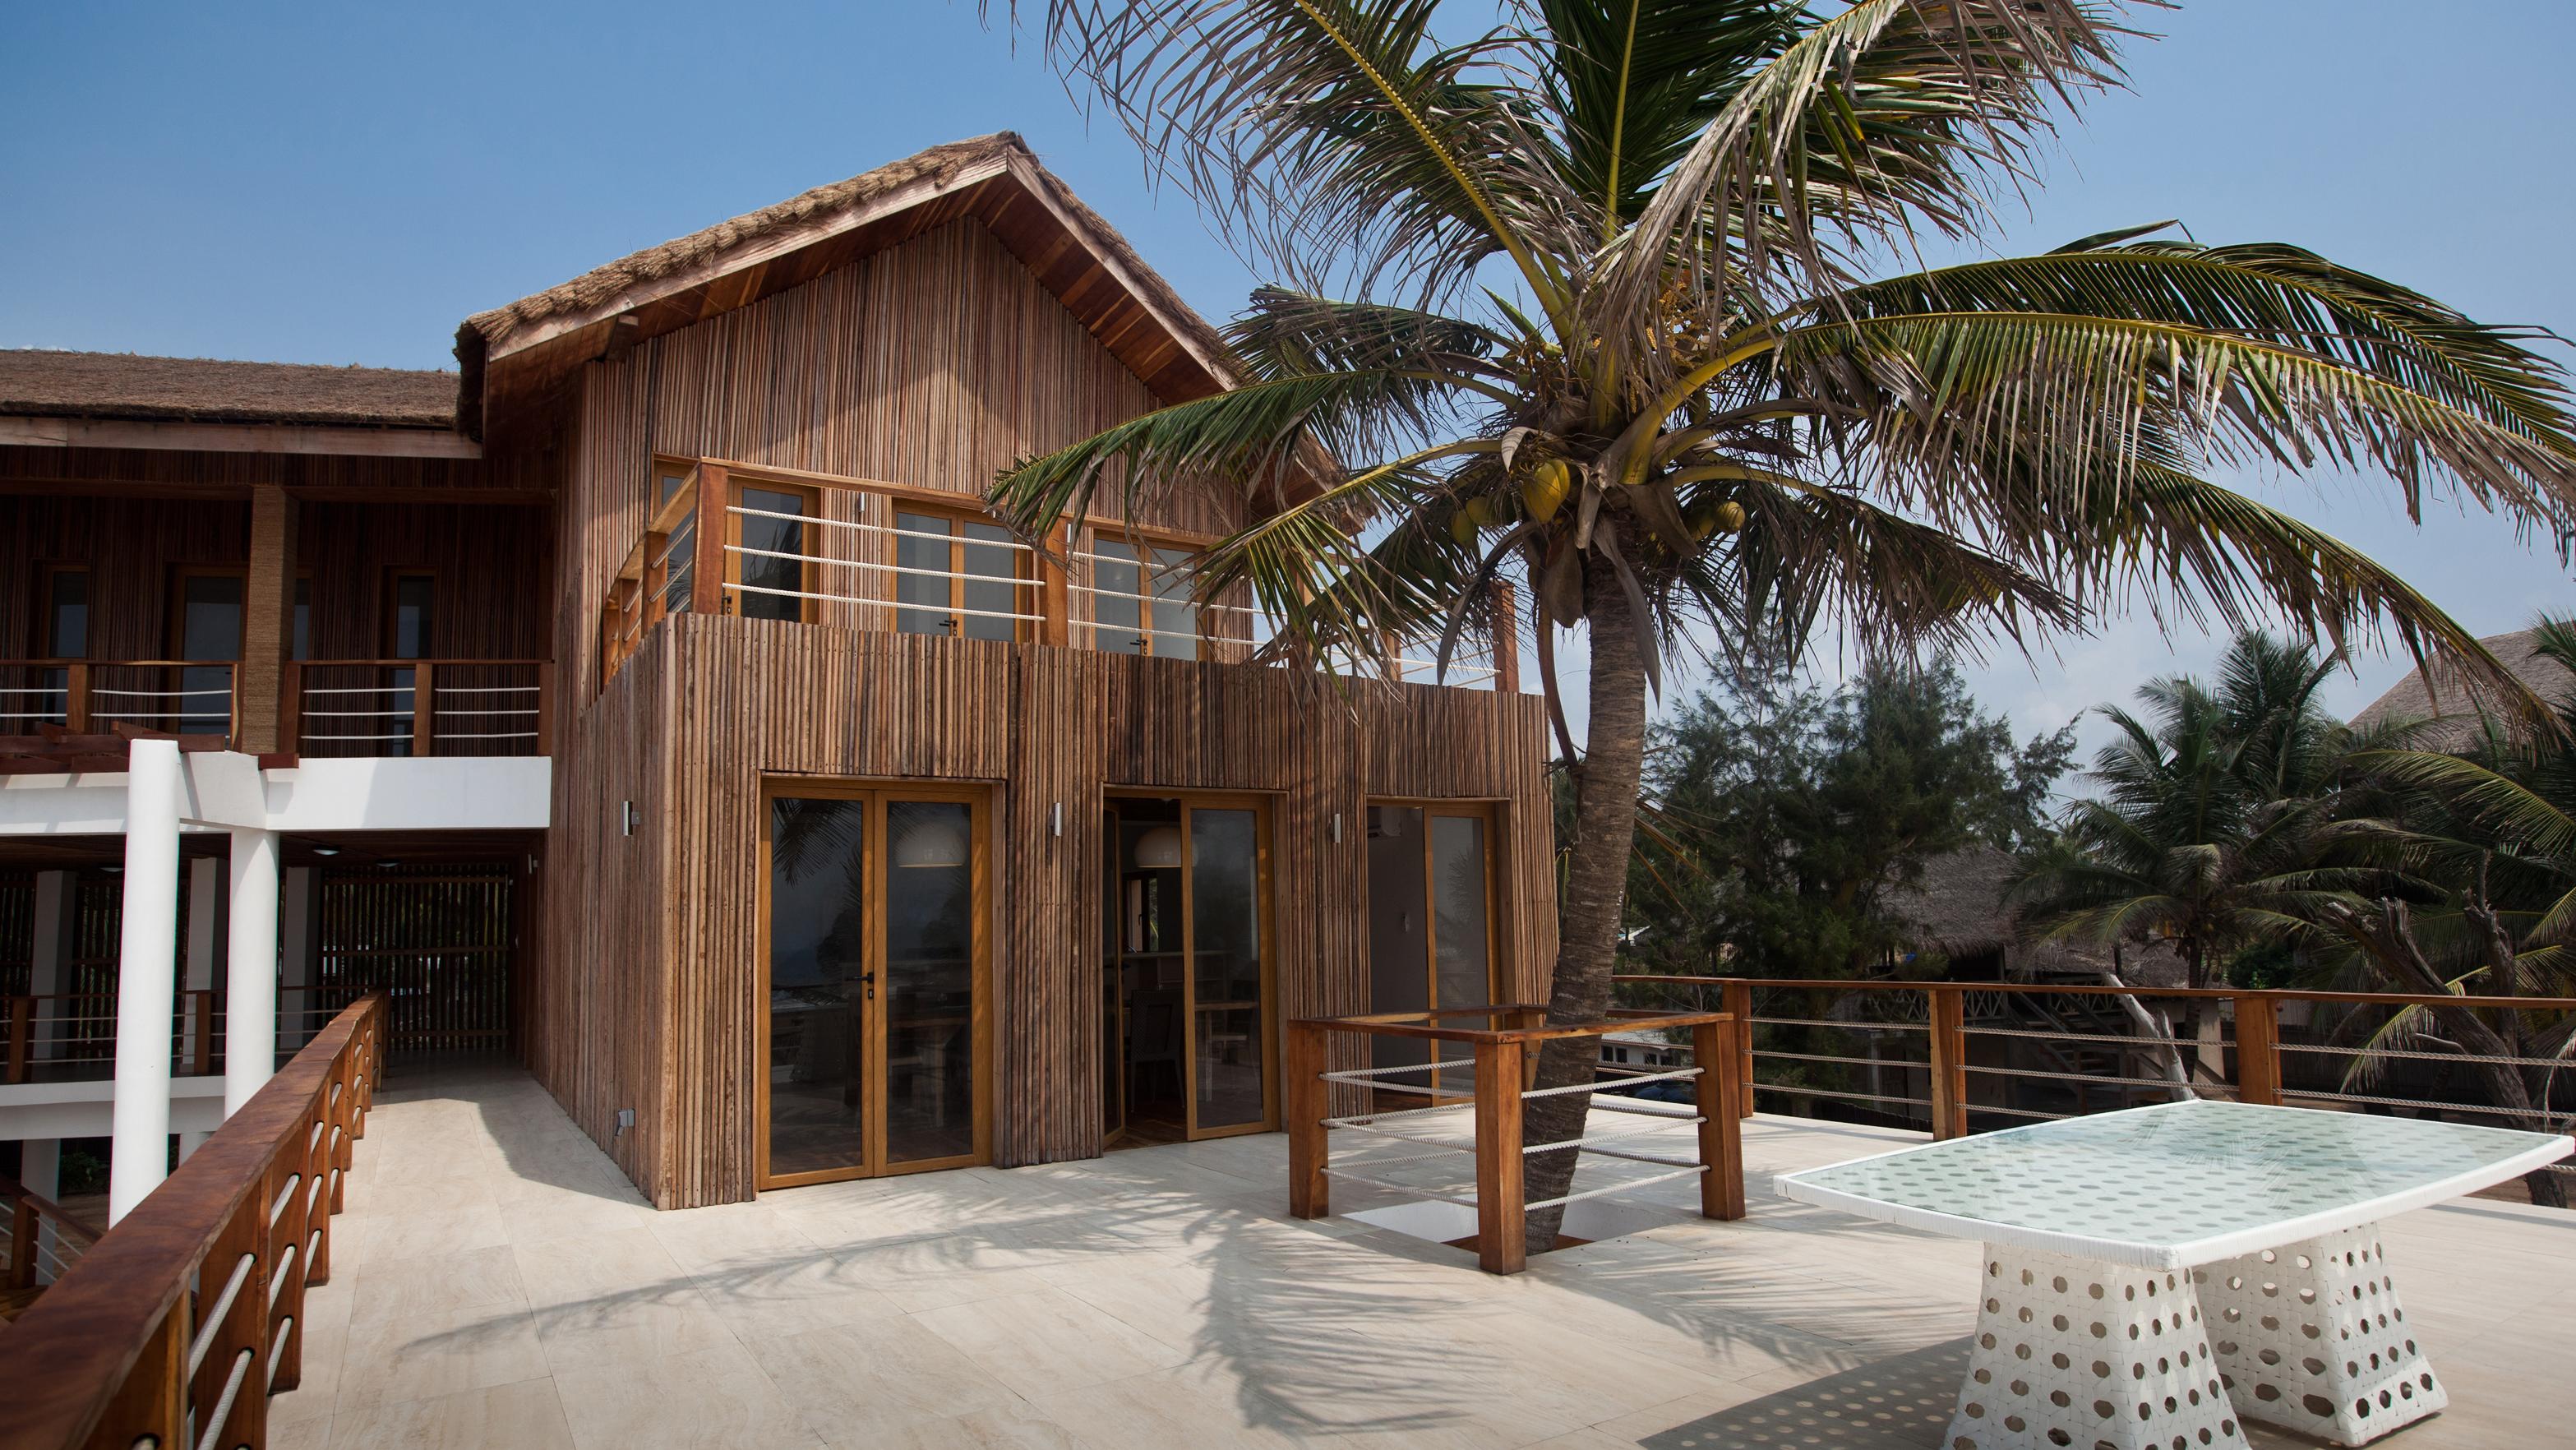 A GETAWAY BY THE GULF ILASHE BEACH HOUSE BY CMD A